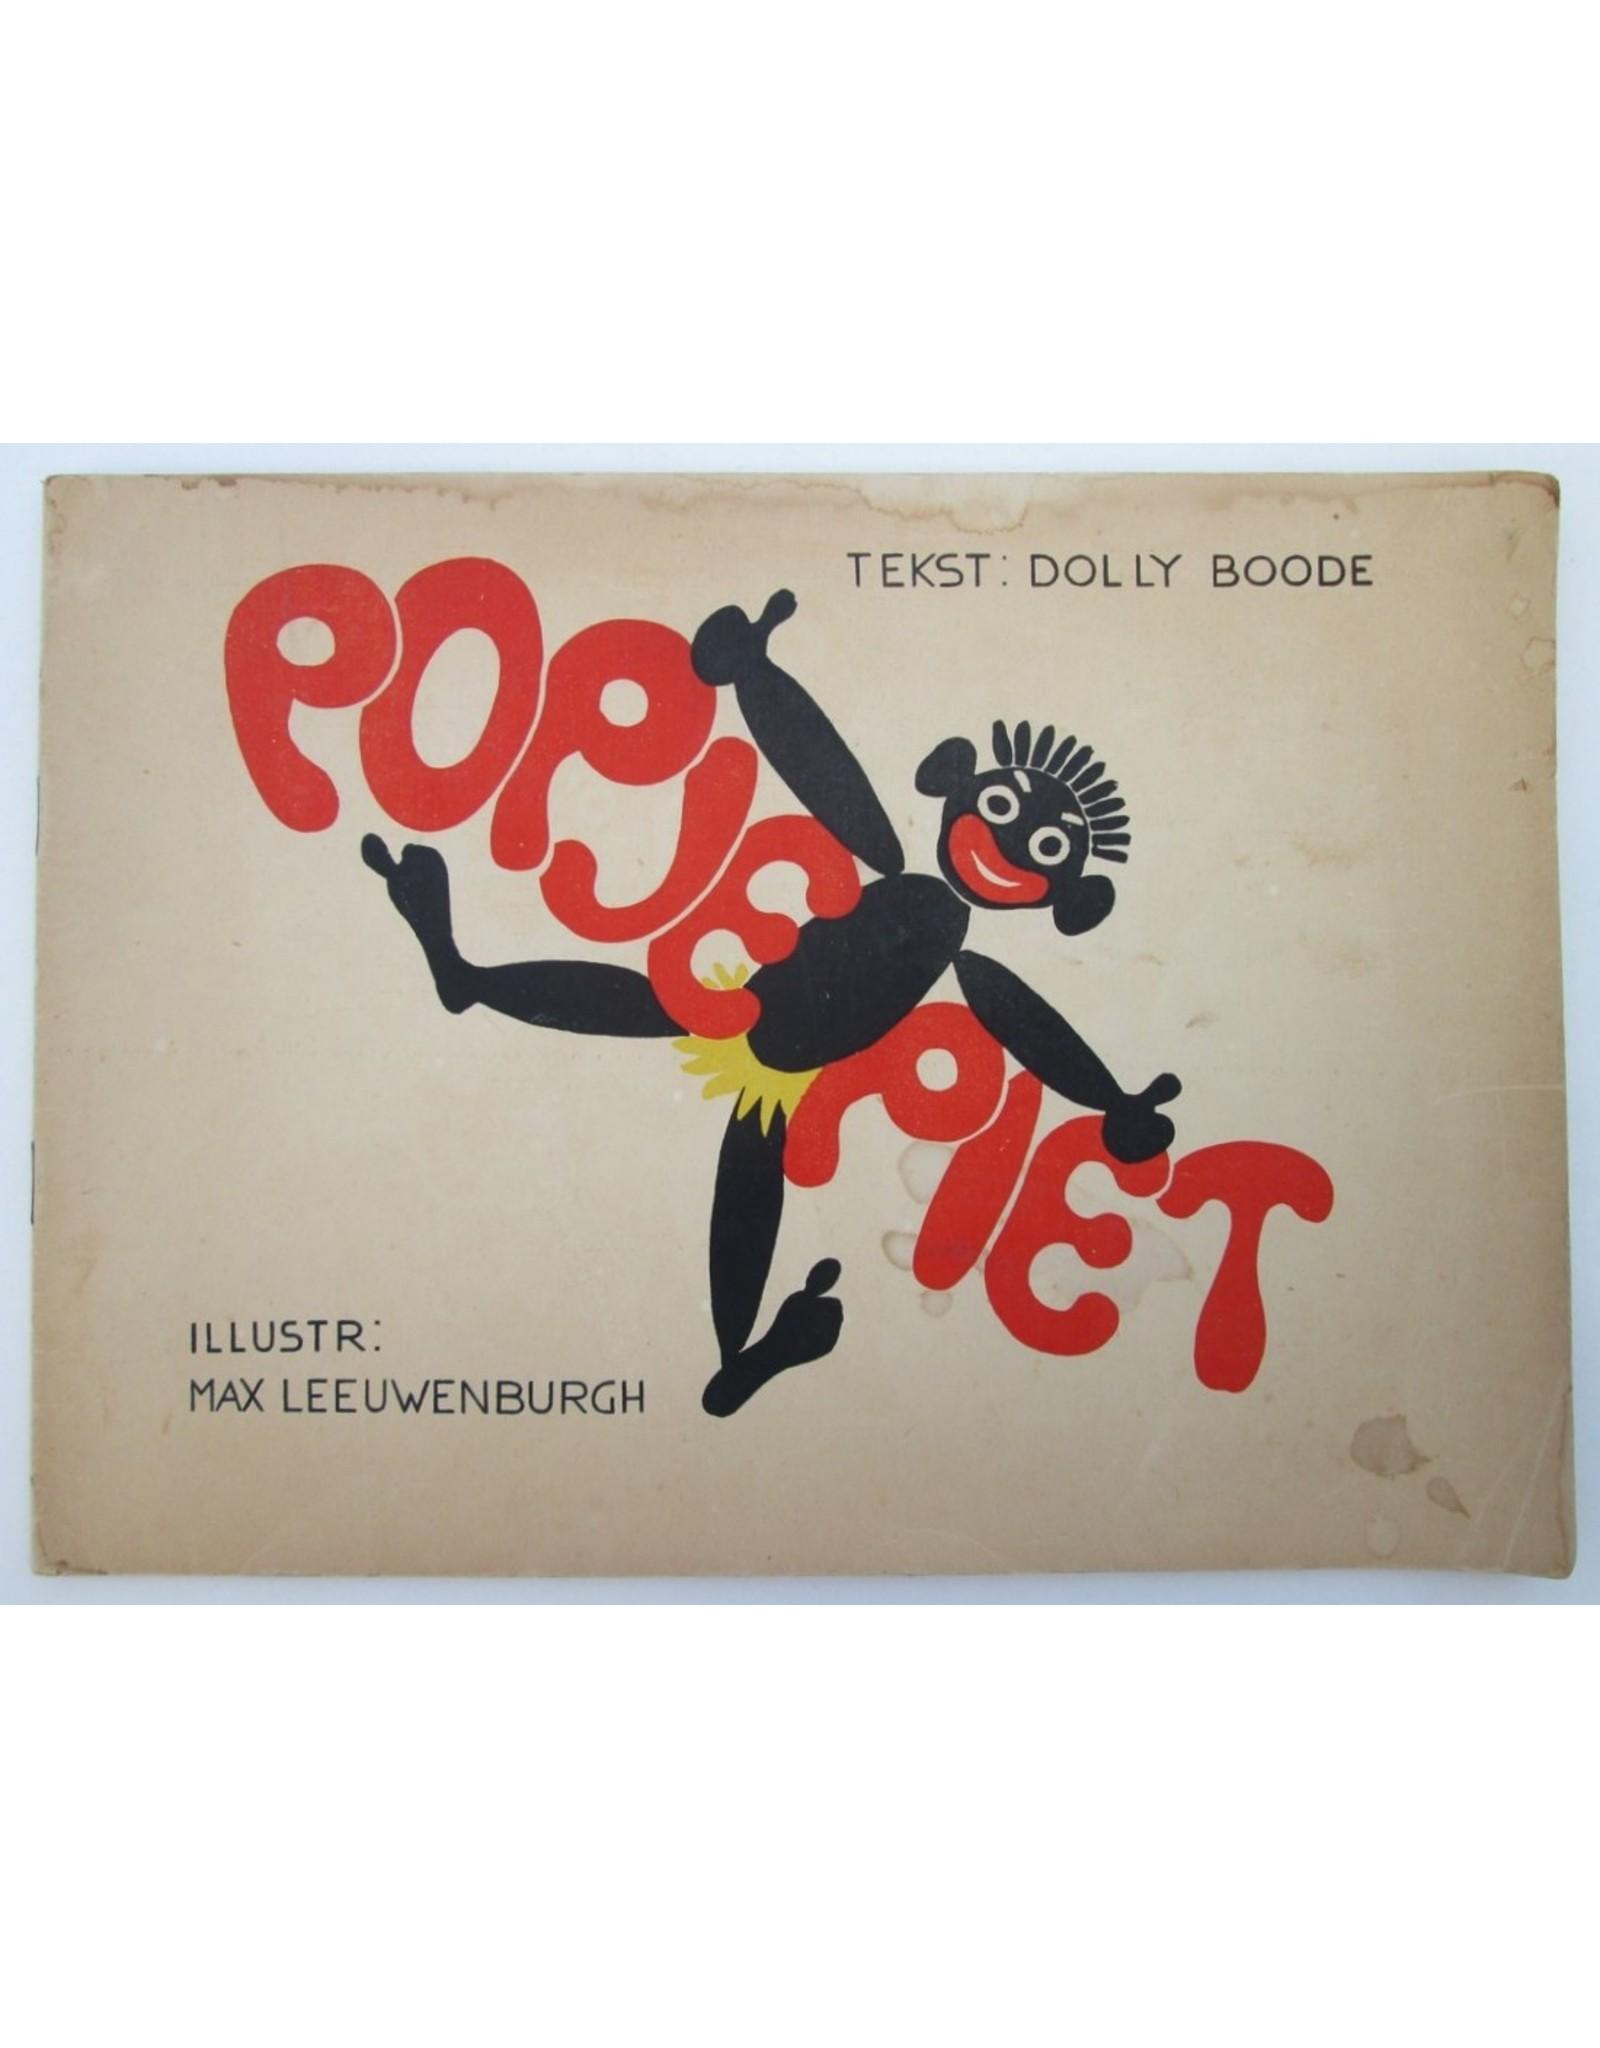 [Sinterklaas] Dolly Boode - Popje Piet. Teekeningen Max Leeuwenburgh